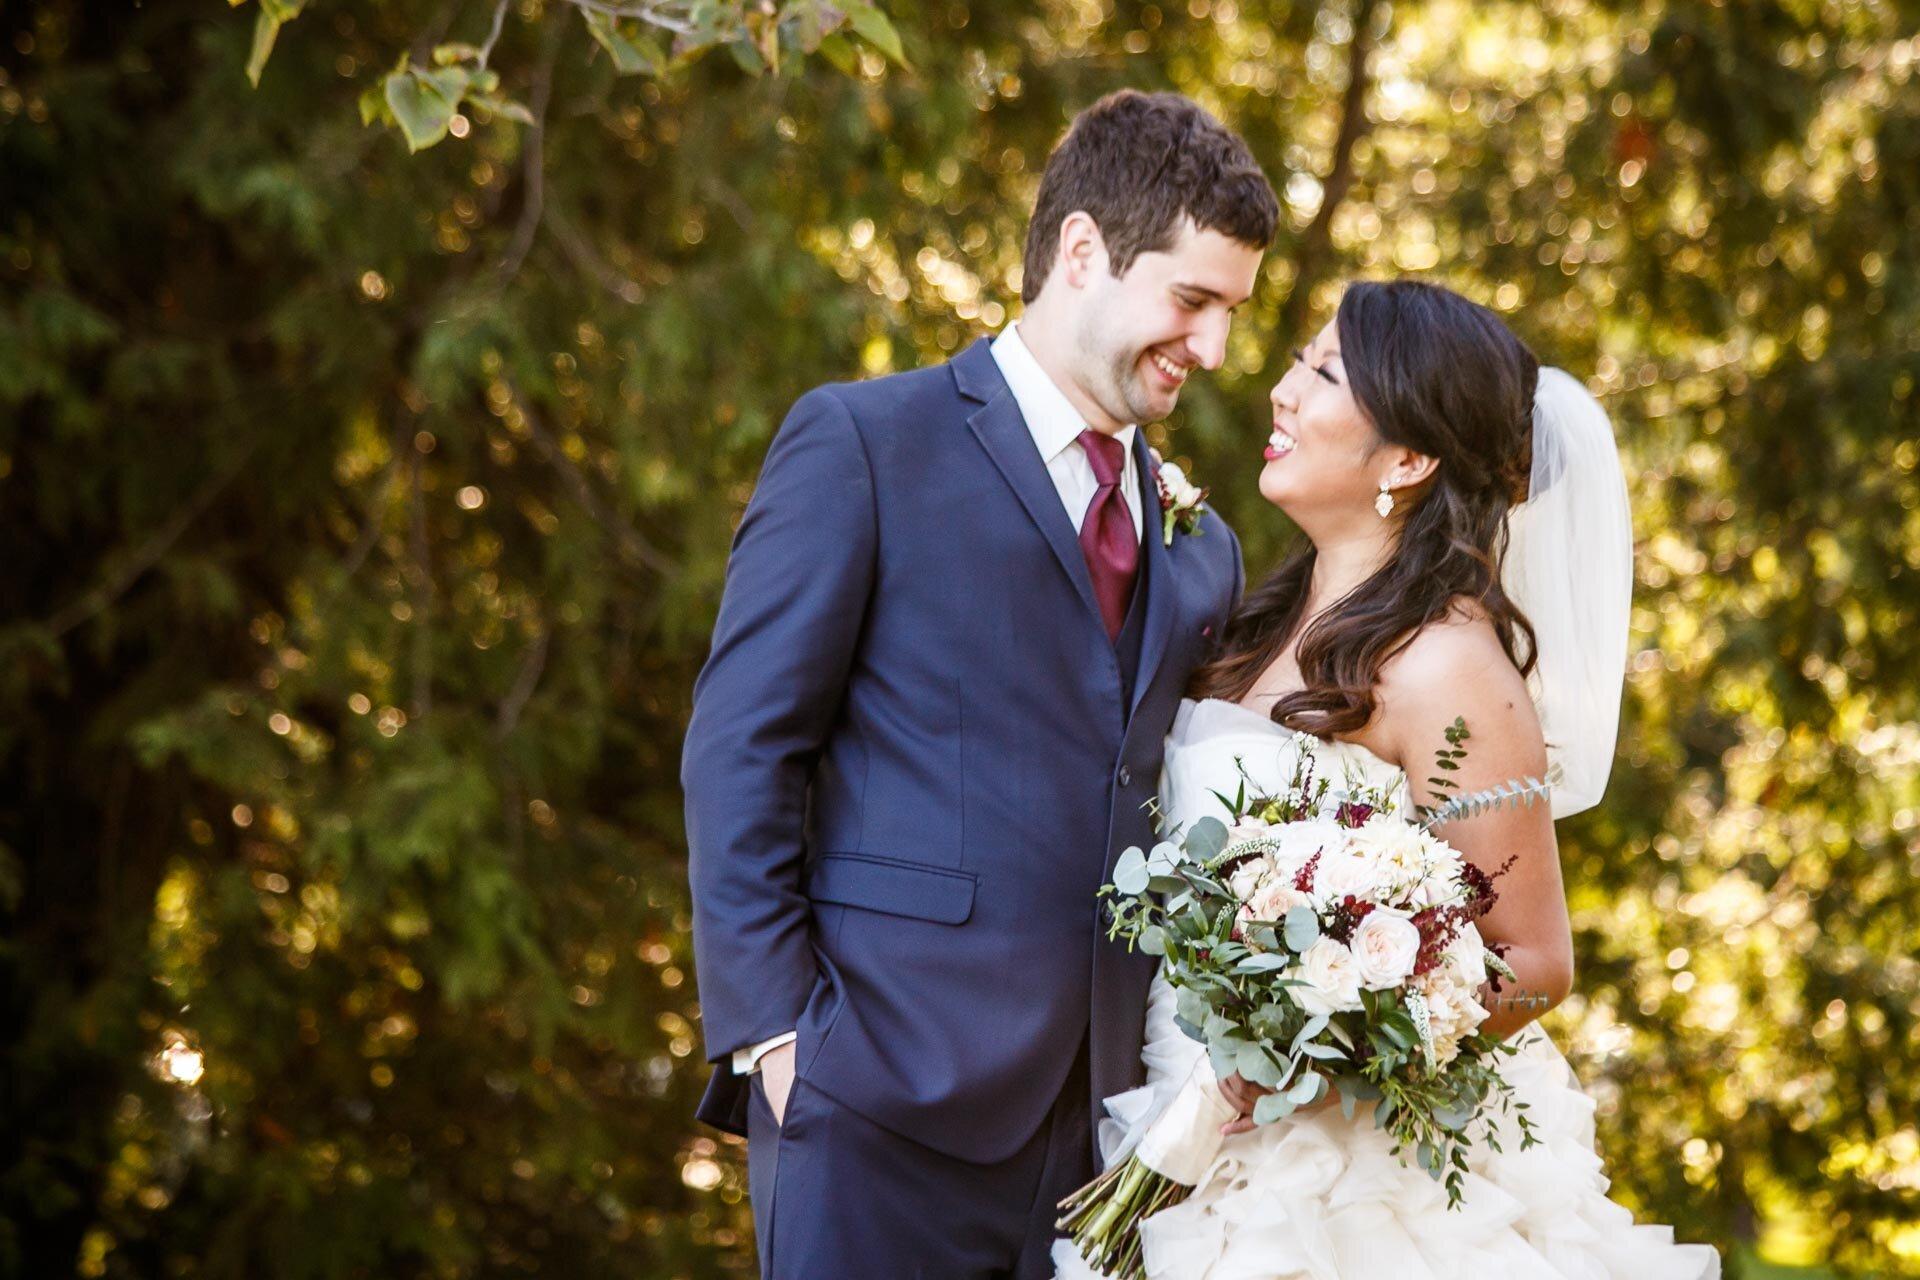 fall-lighting-adam-shea-photography-wedding-engagement-blog-adam-shea-photography-green-bay-appleton-neenah-photographer-17.jpg